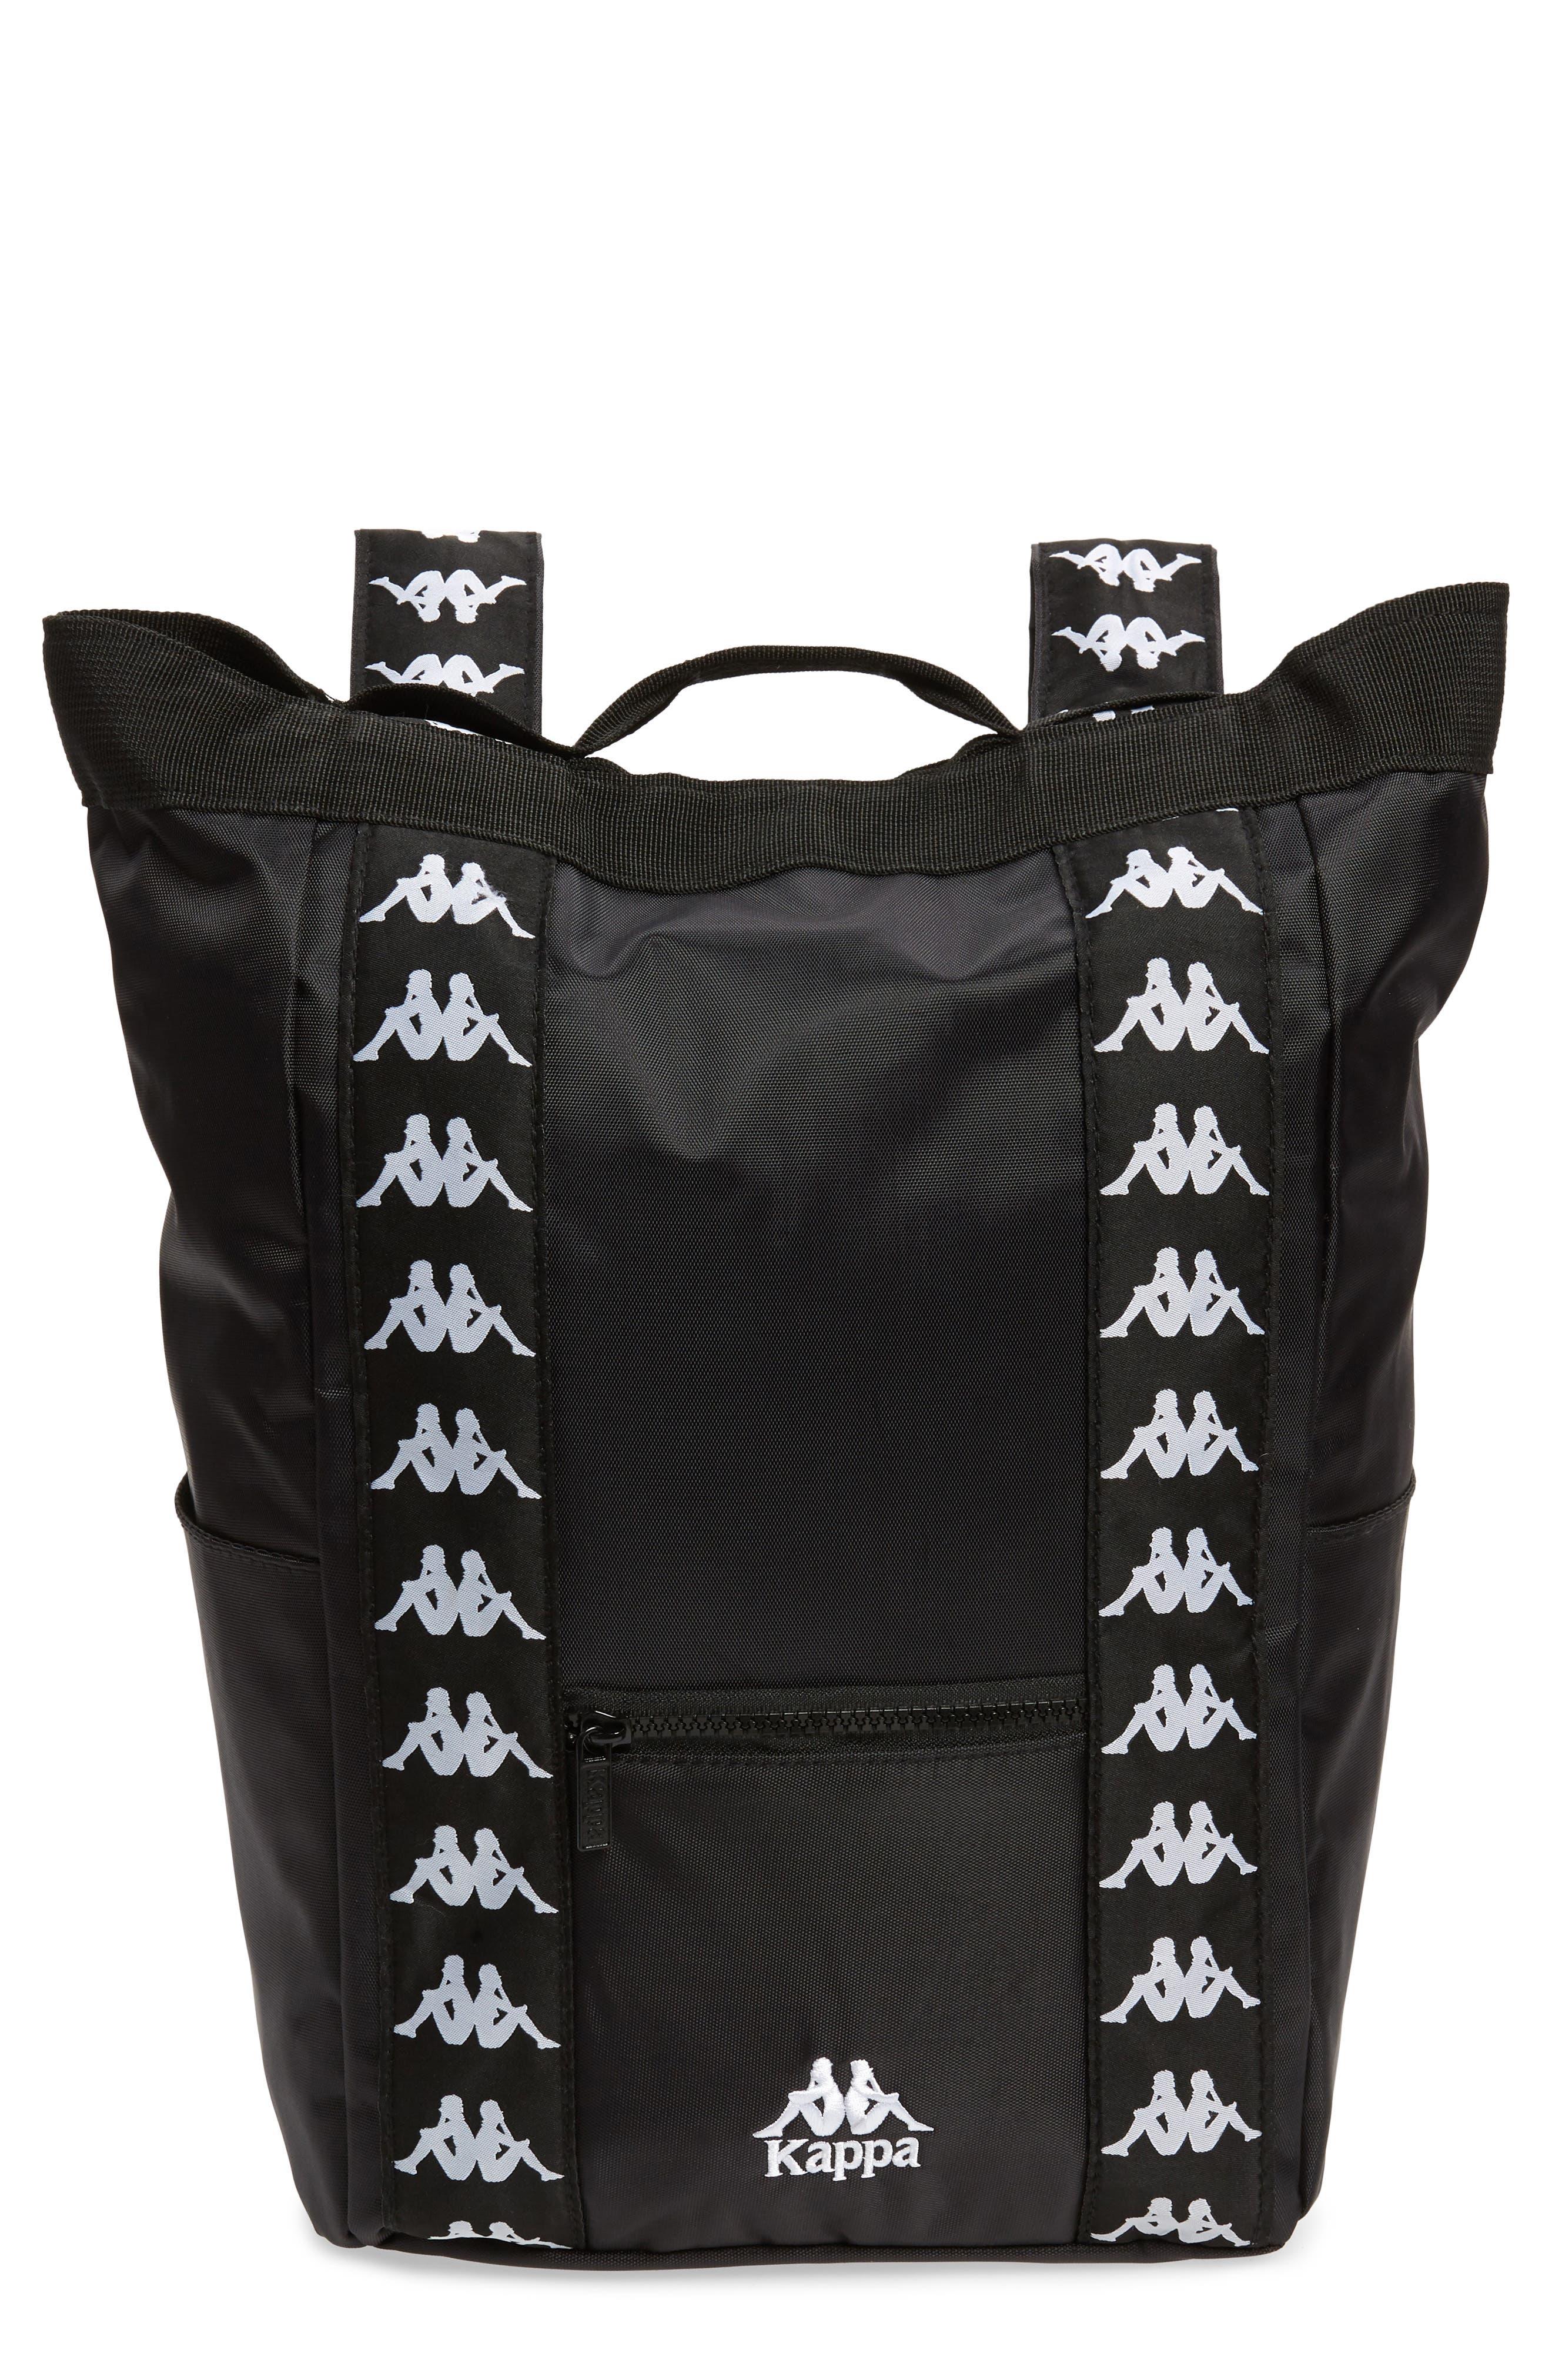 Medium Athletic Backpack,                             Main thumbnail 1, color,                             BLACK-WHITE